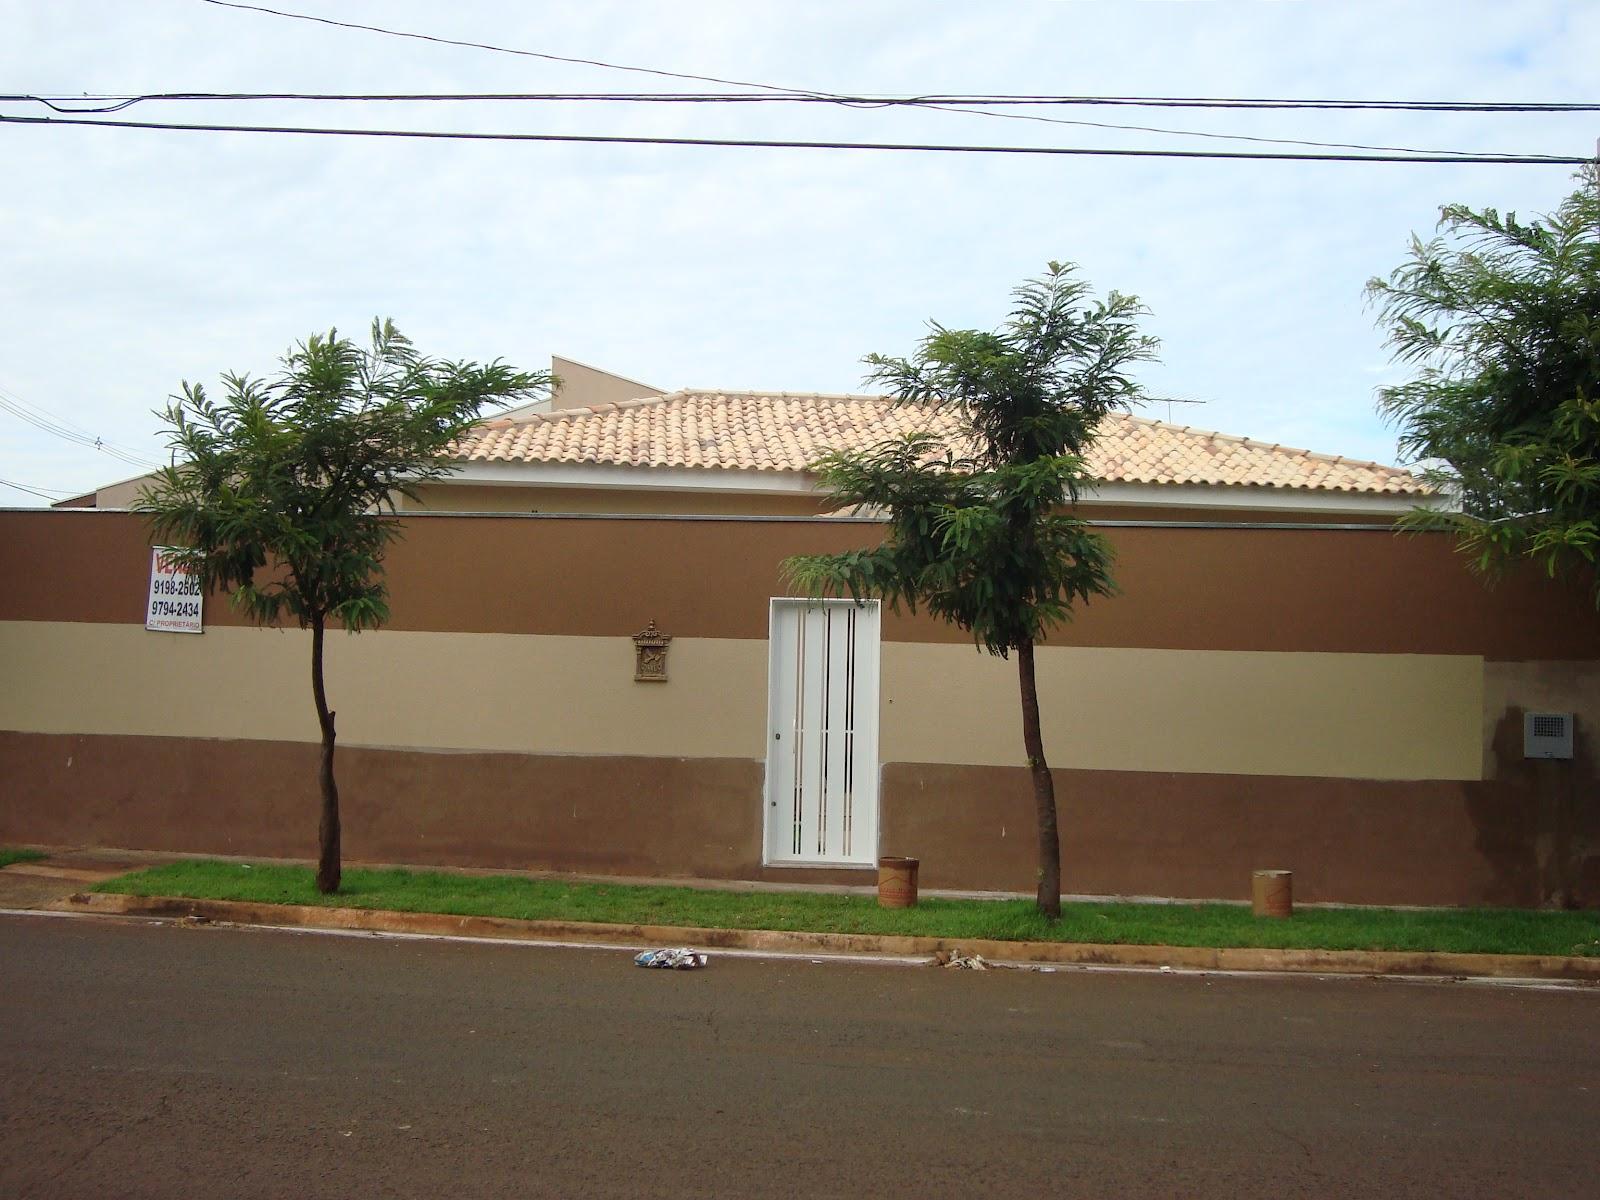 #30769B 112. quintal jardim ribeirao preto:Jardim Ouro Branco – Av. Prof  682 Janelas Pvc Ribeirao Preto